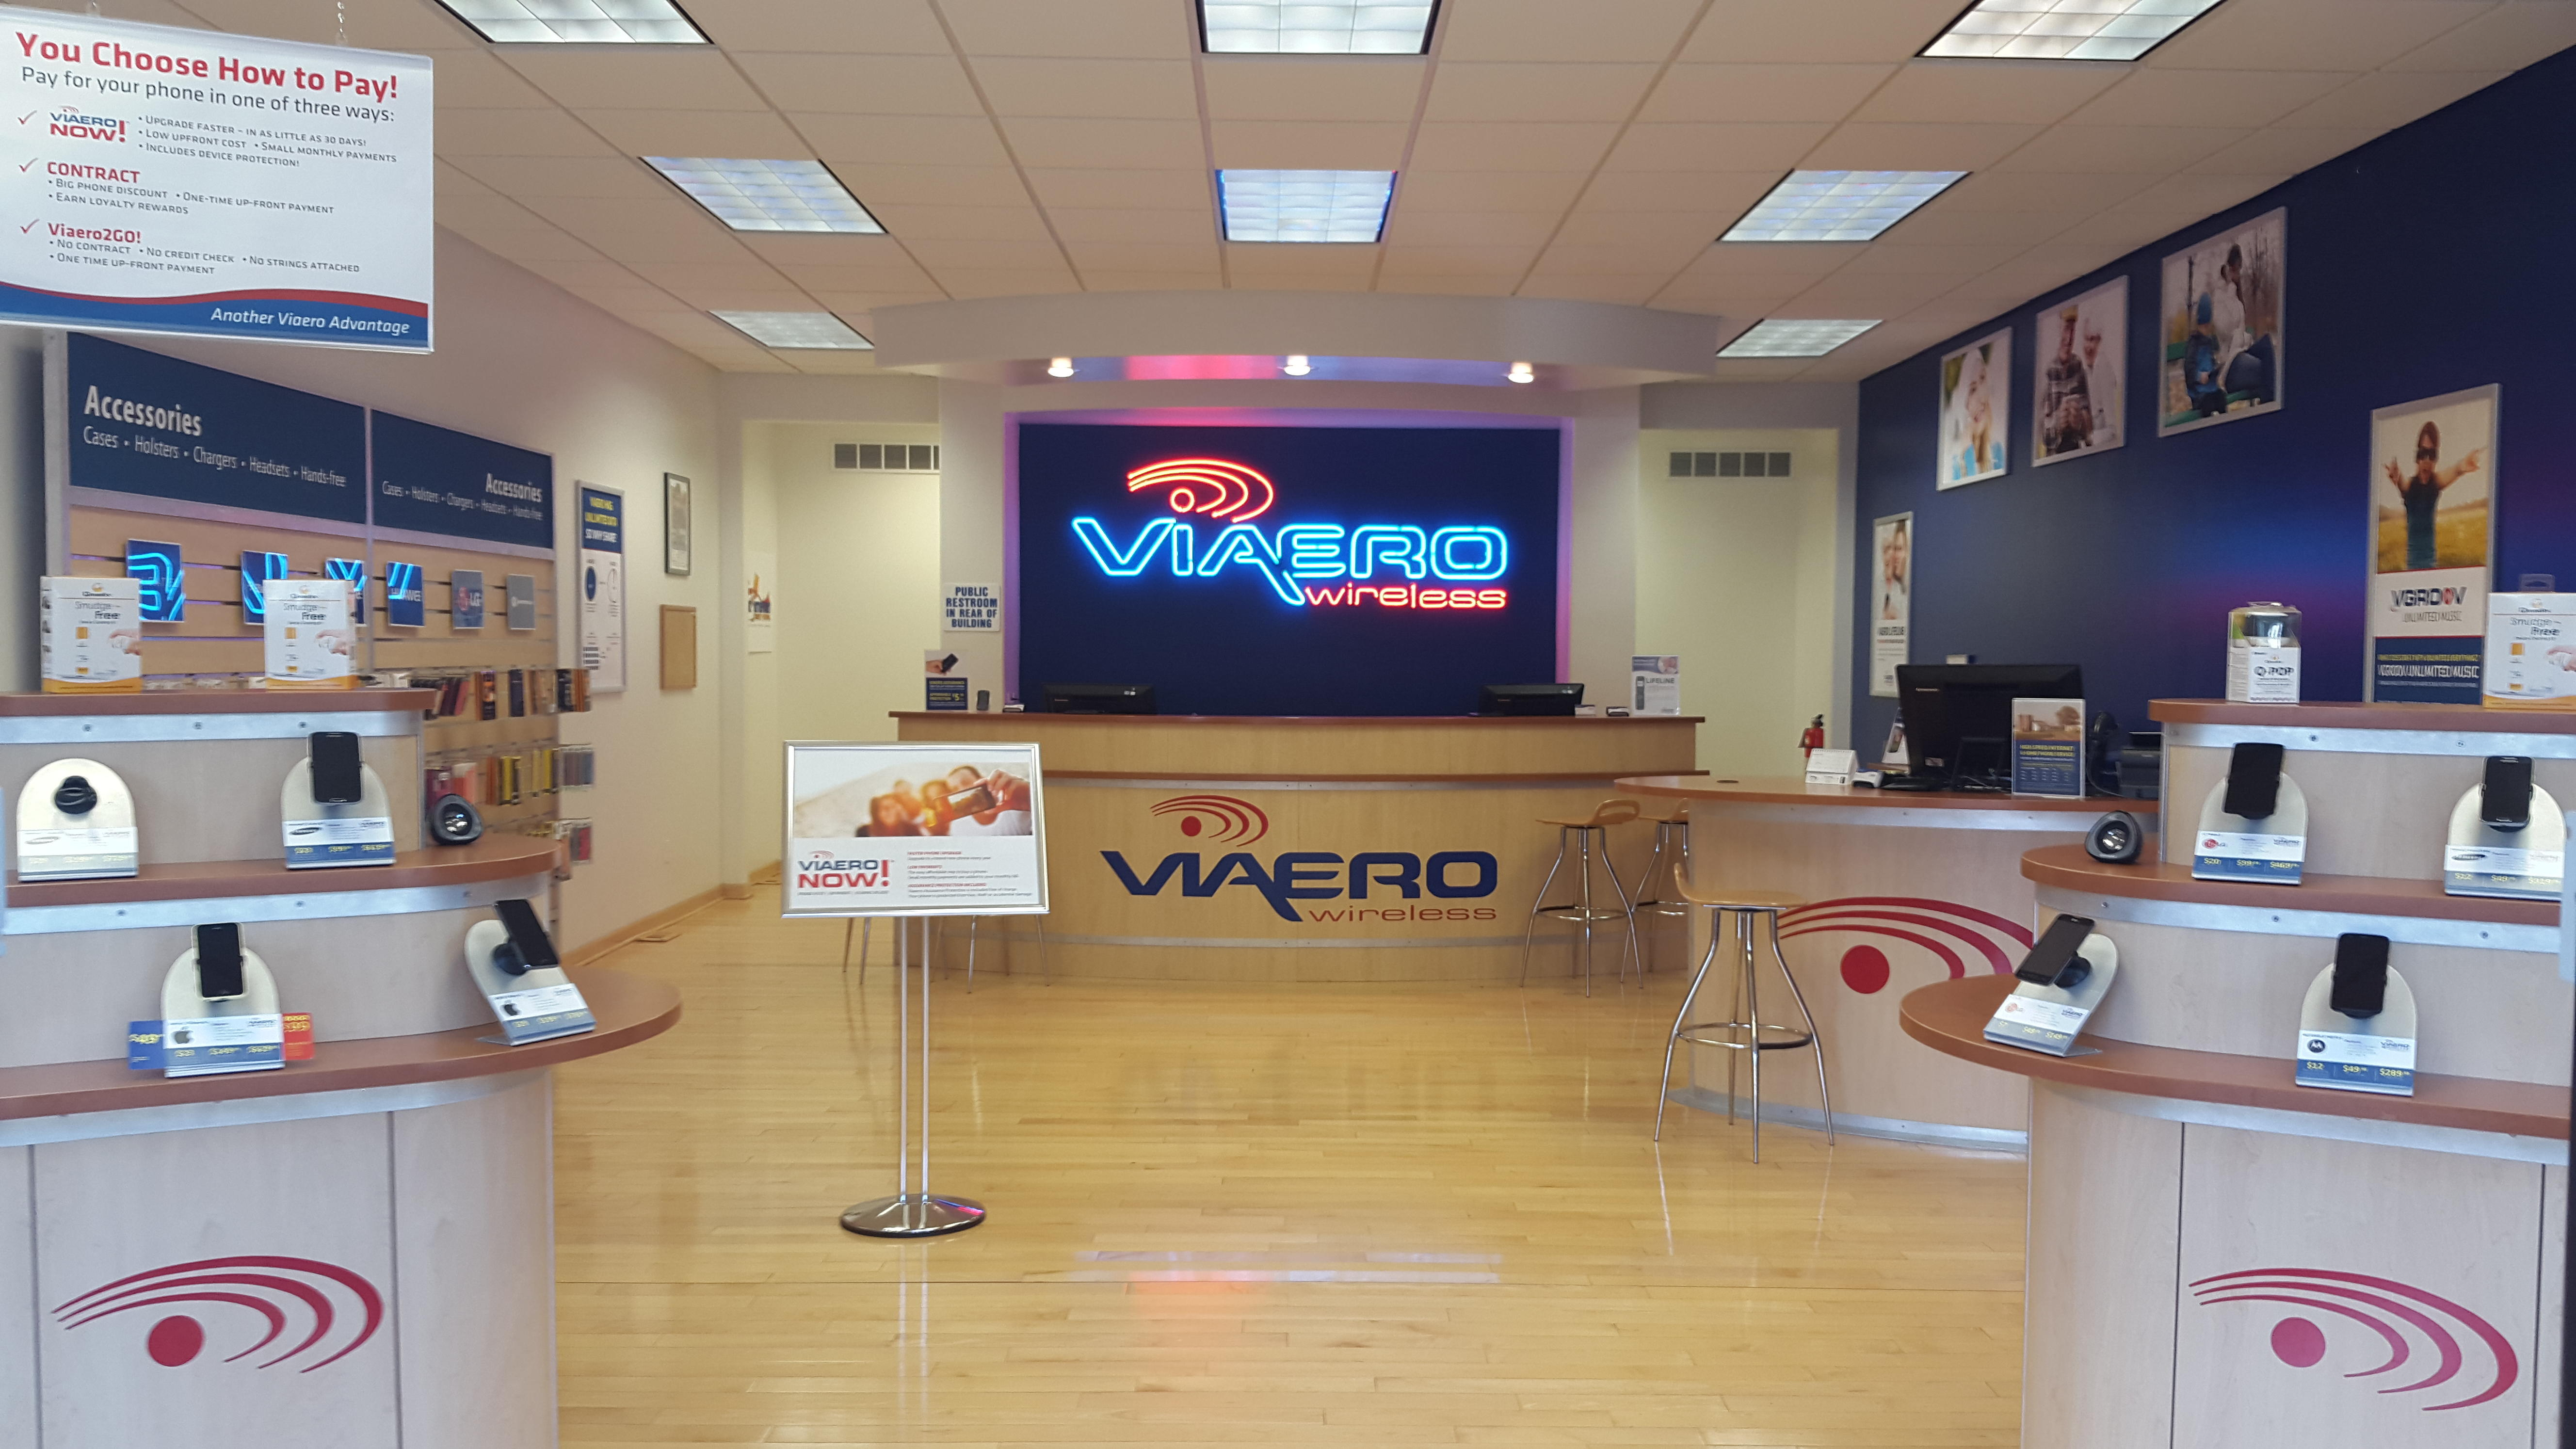 Viaero Wireless image 0